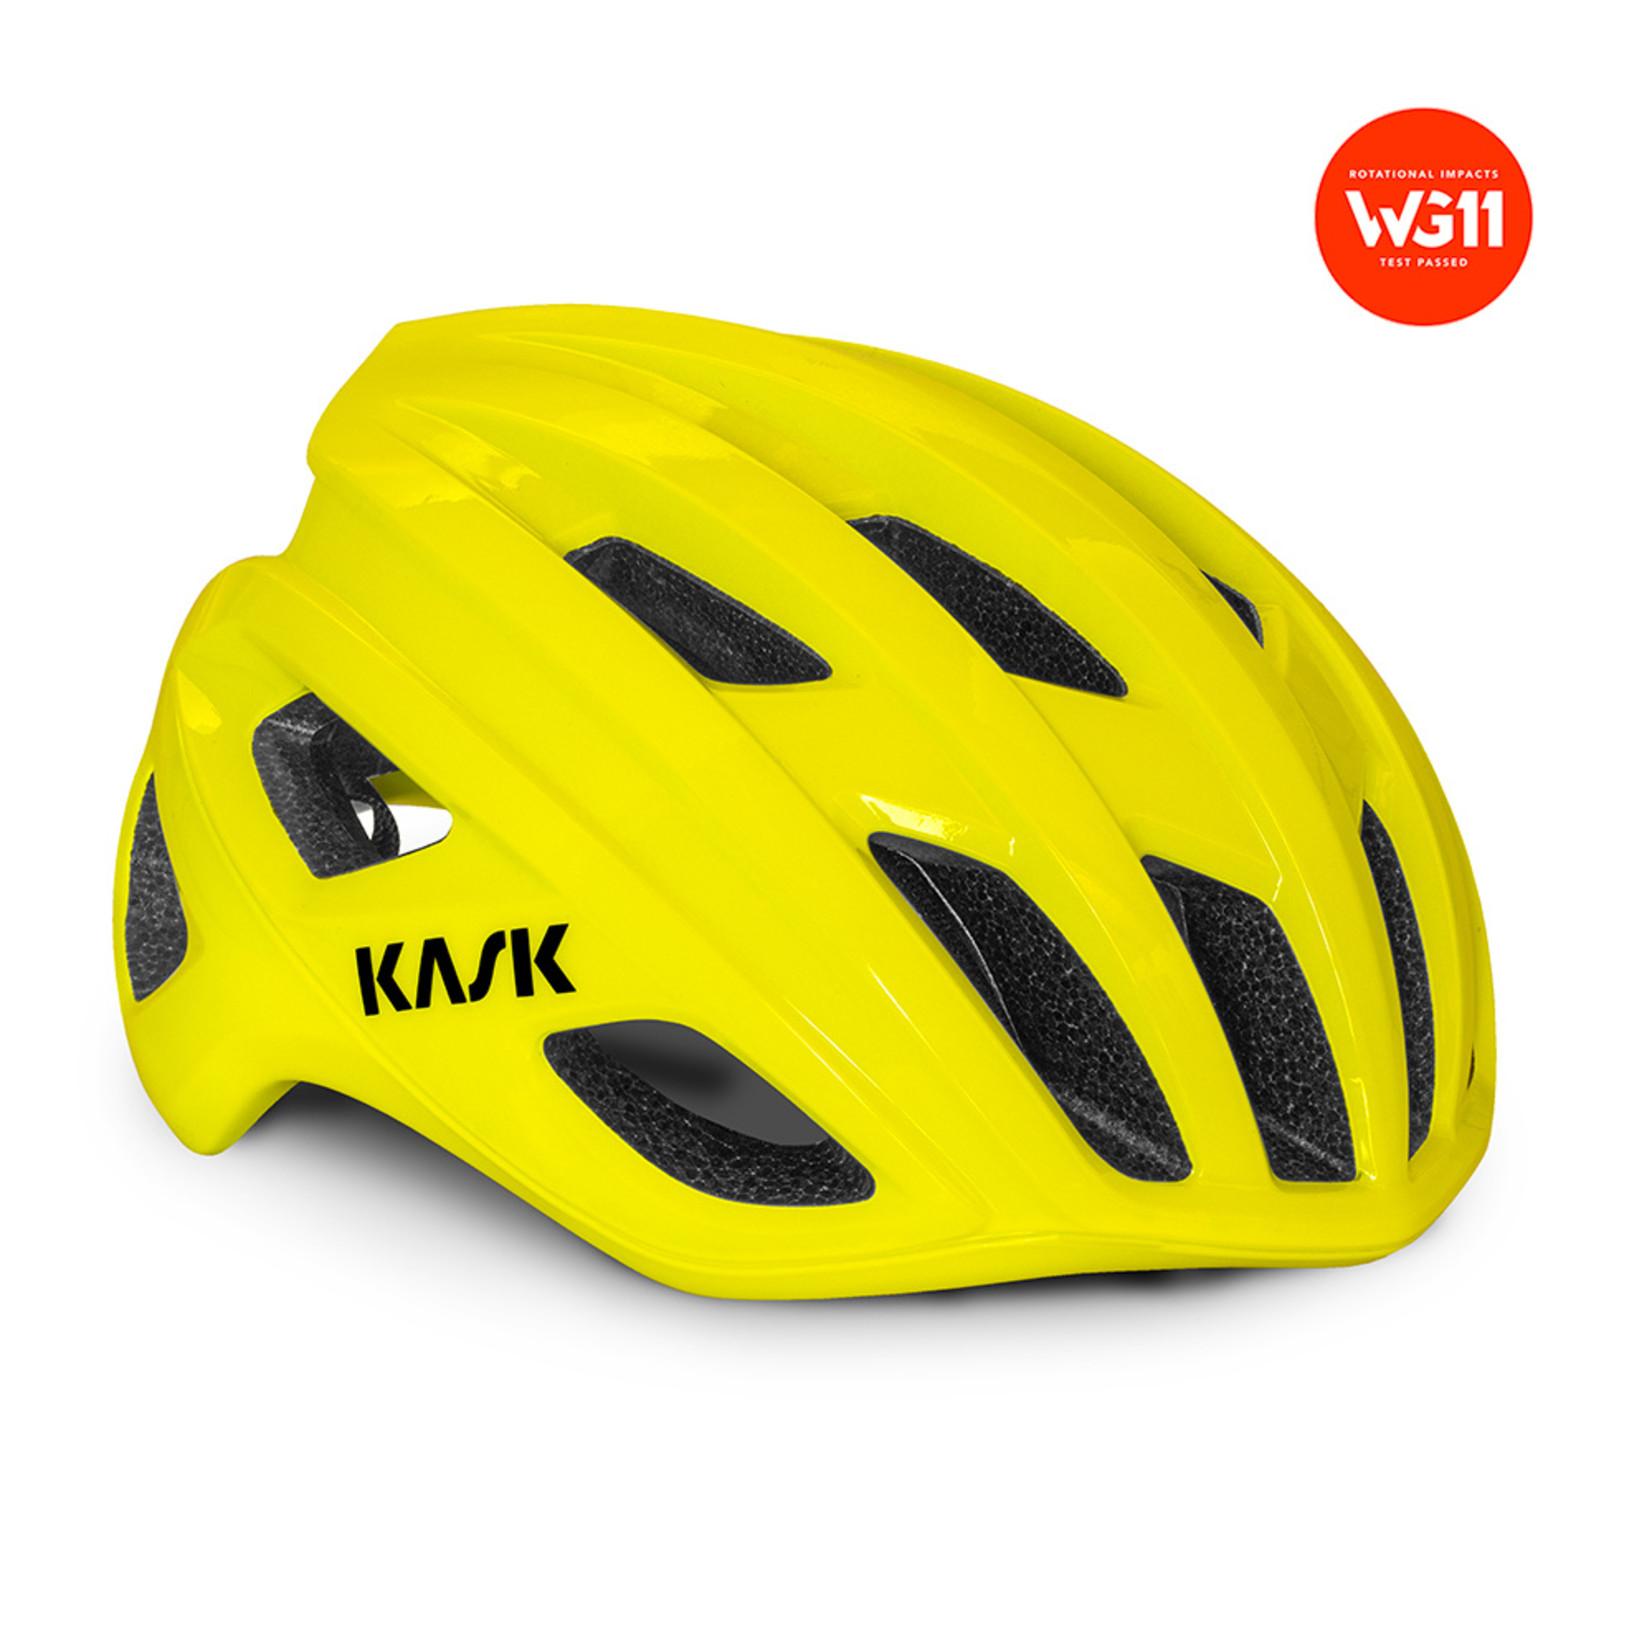 Kask Kask, Helmet Mojito 3 WG11